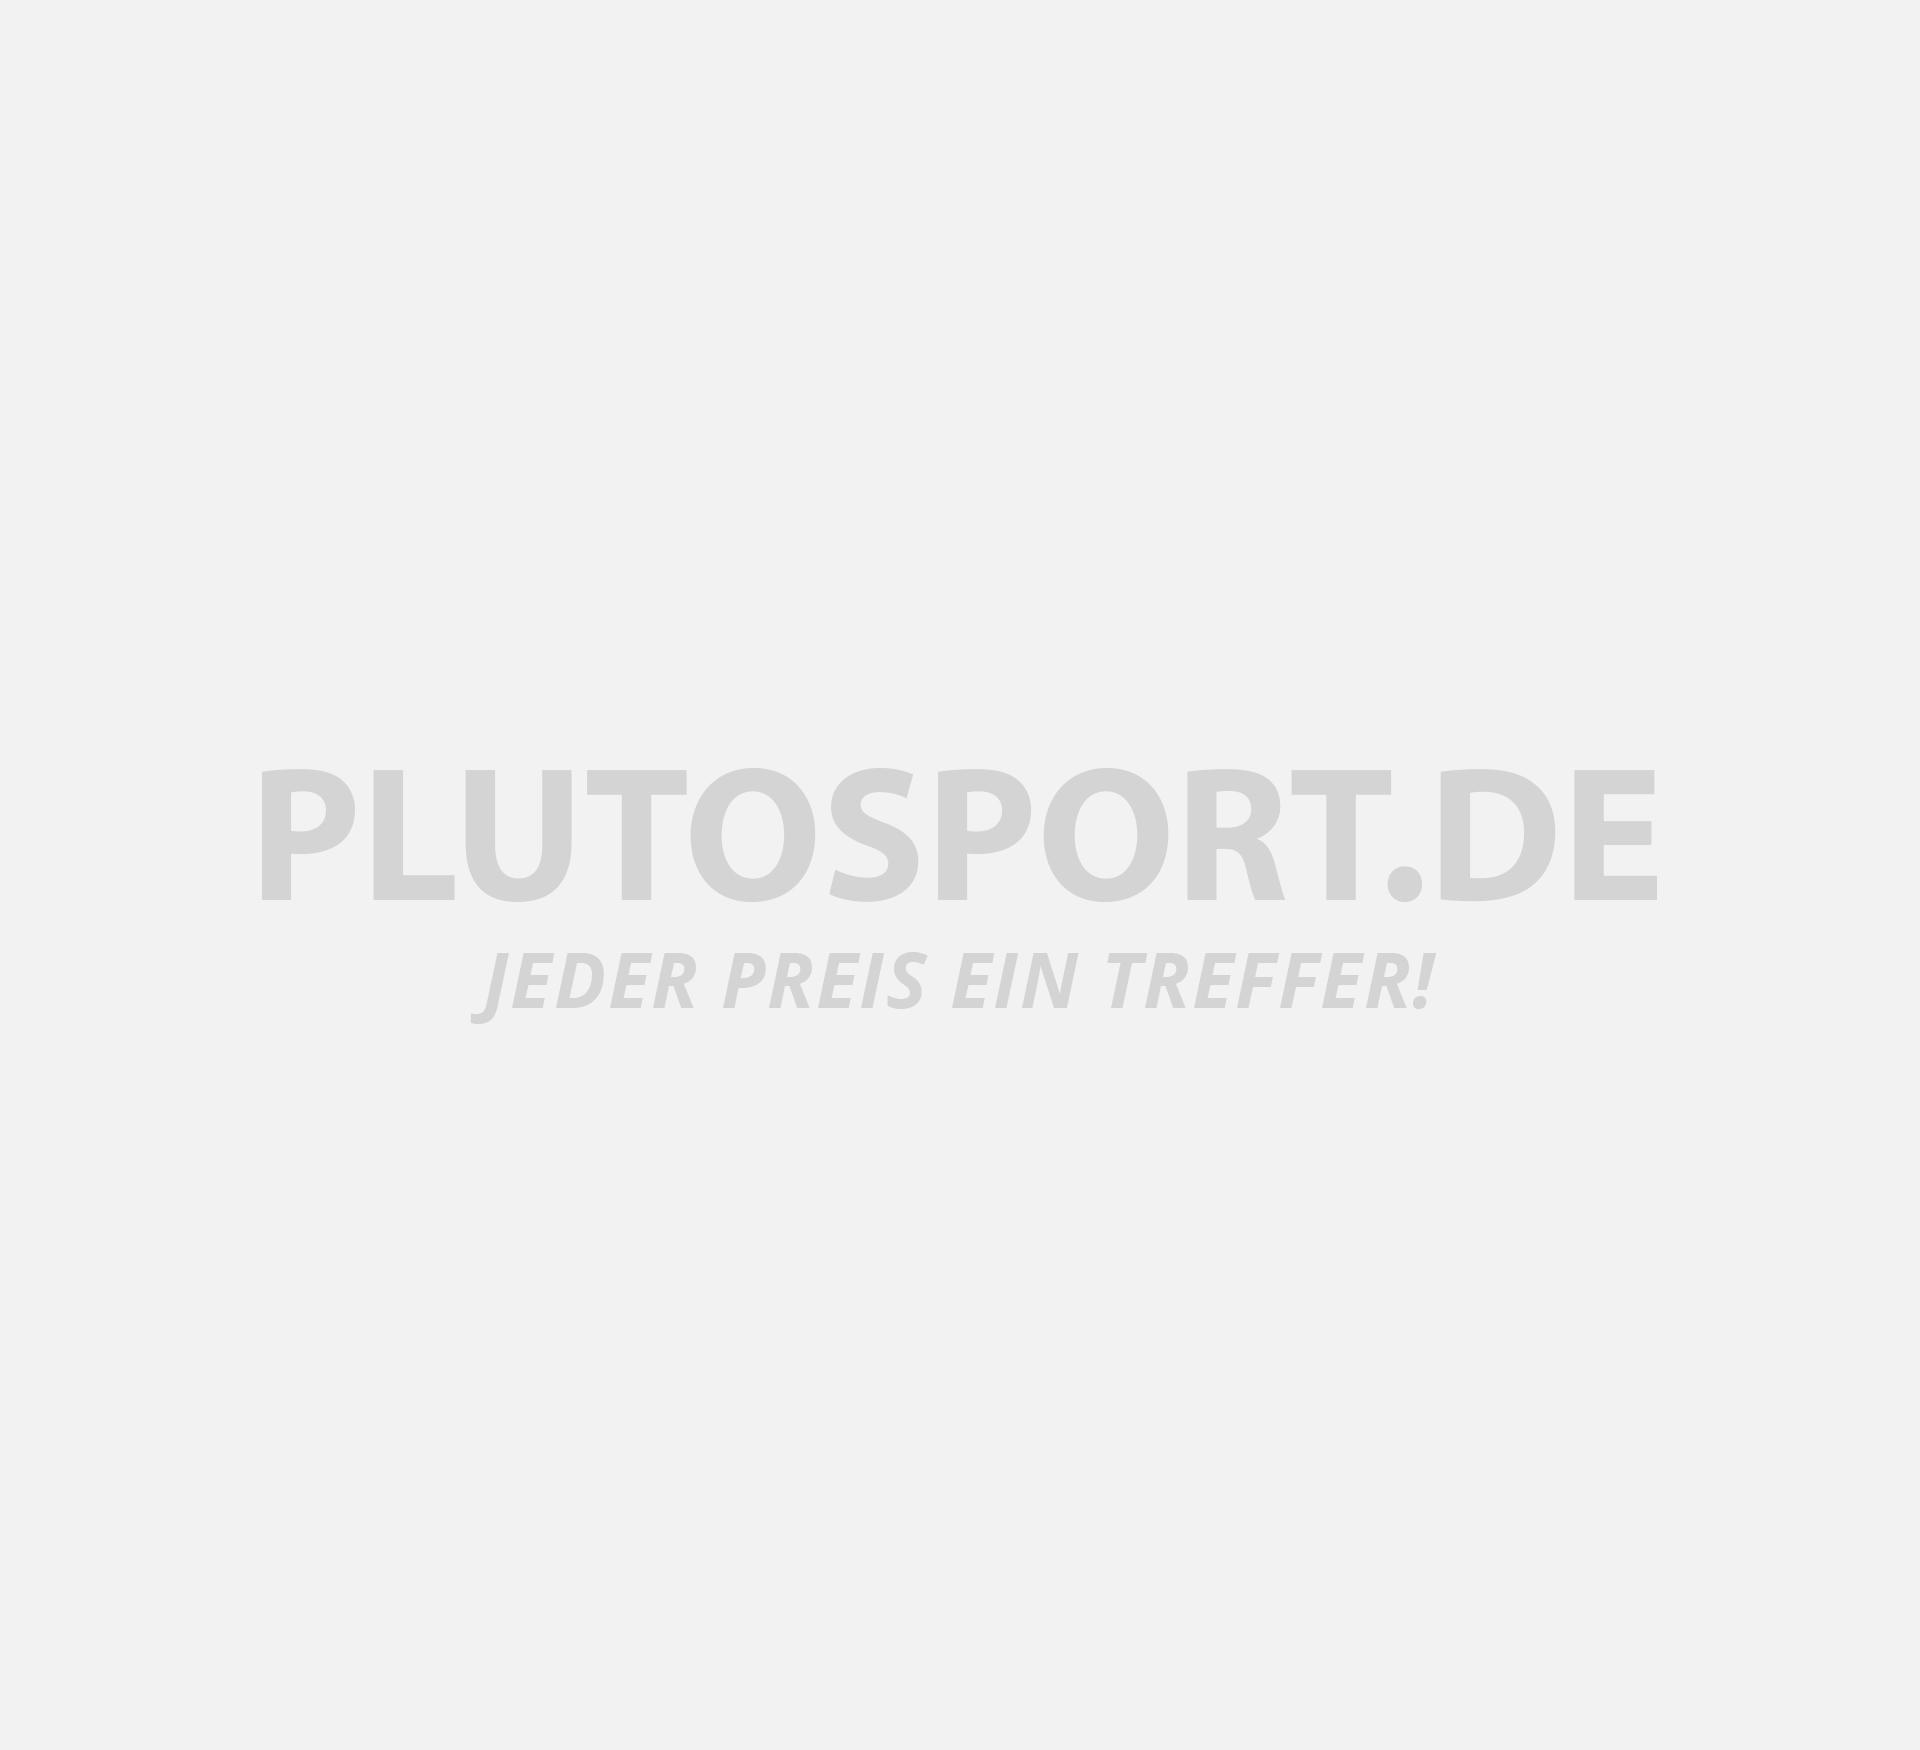 Adidas Juventus Heimspiel Shirt Herren